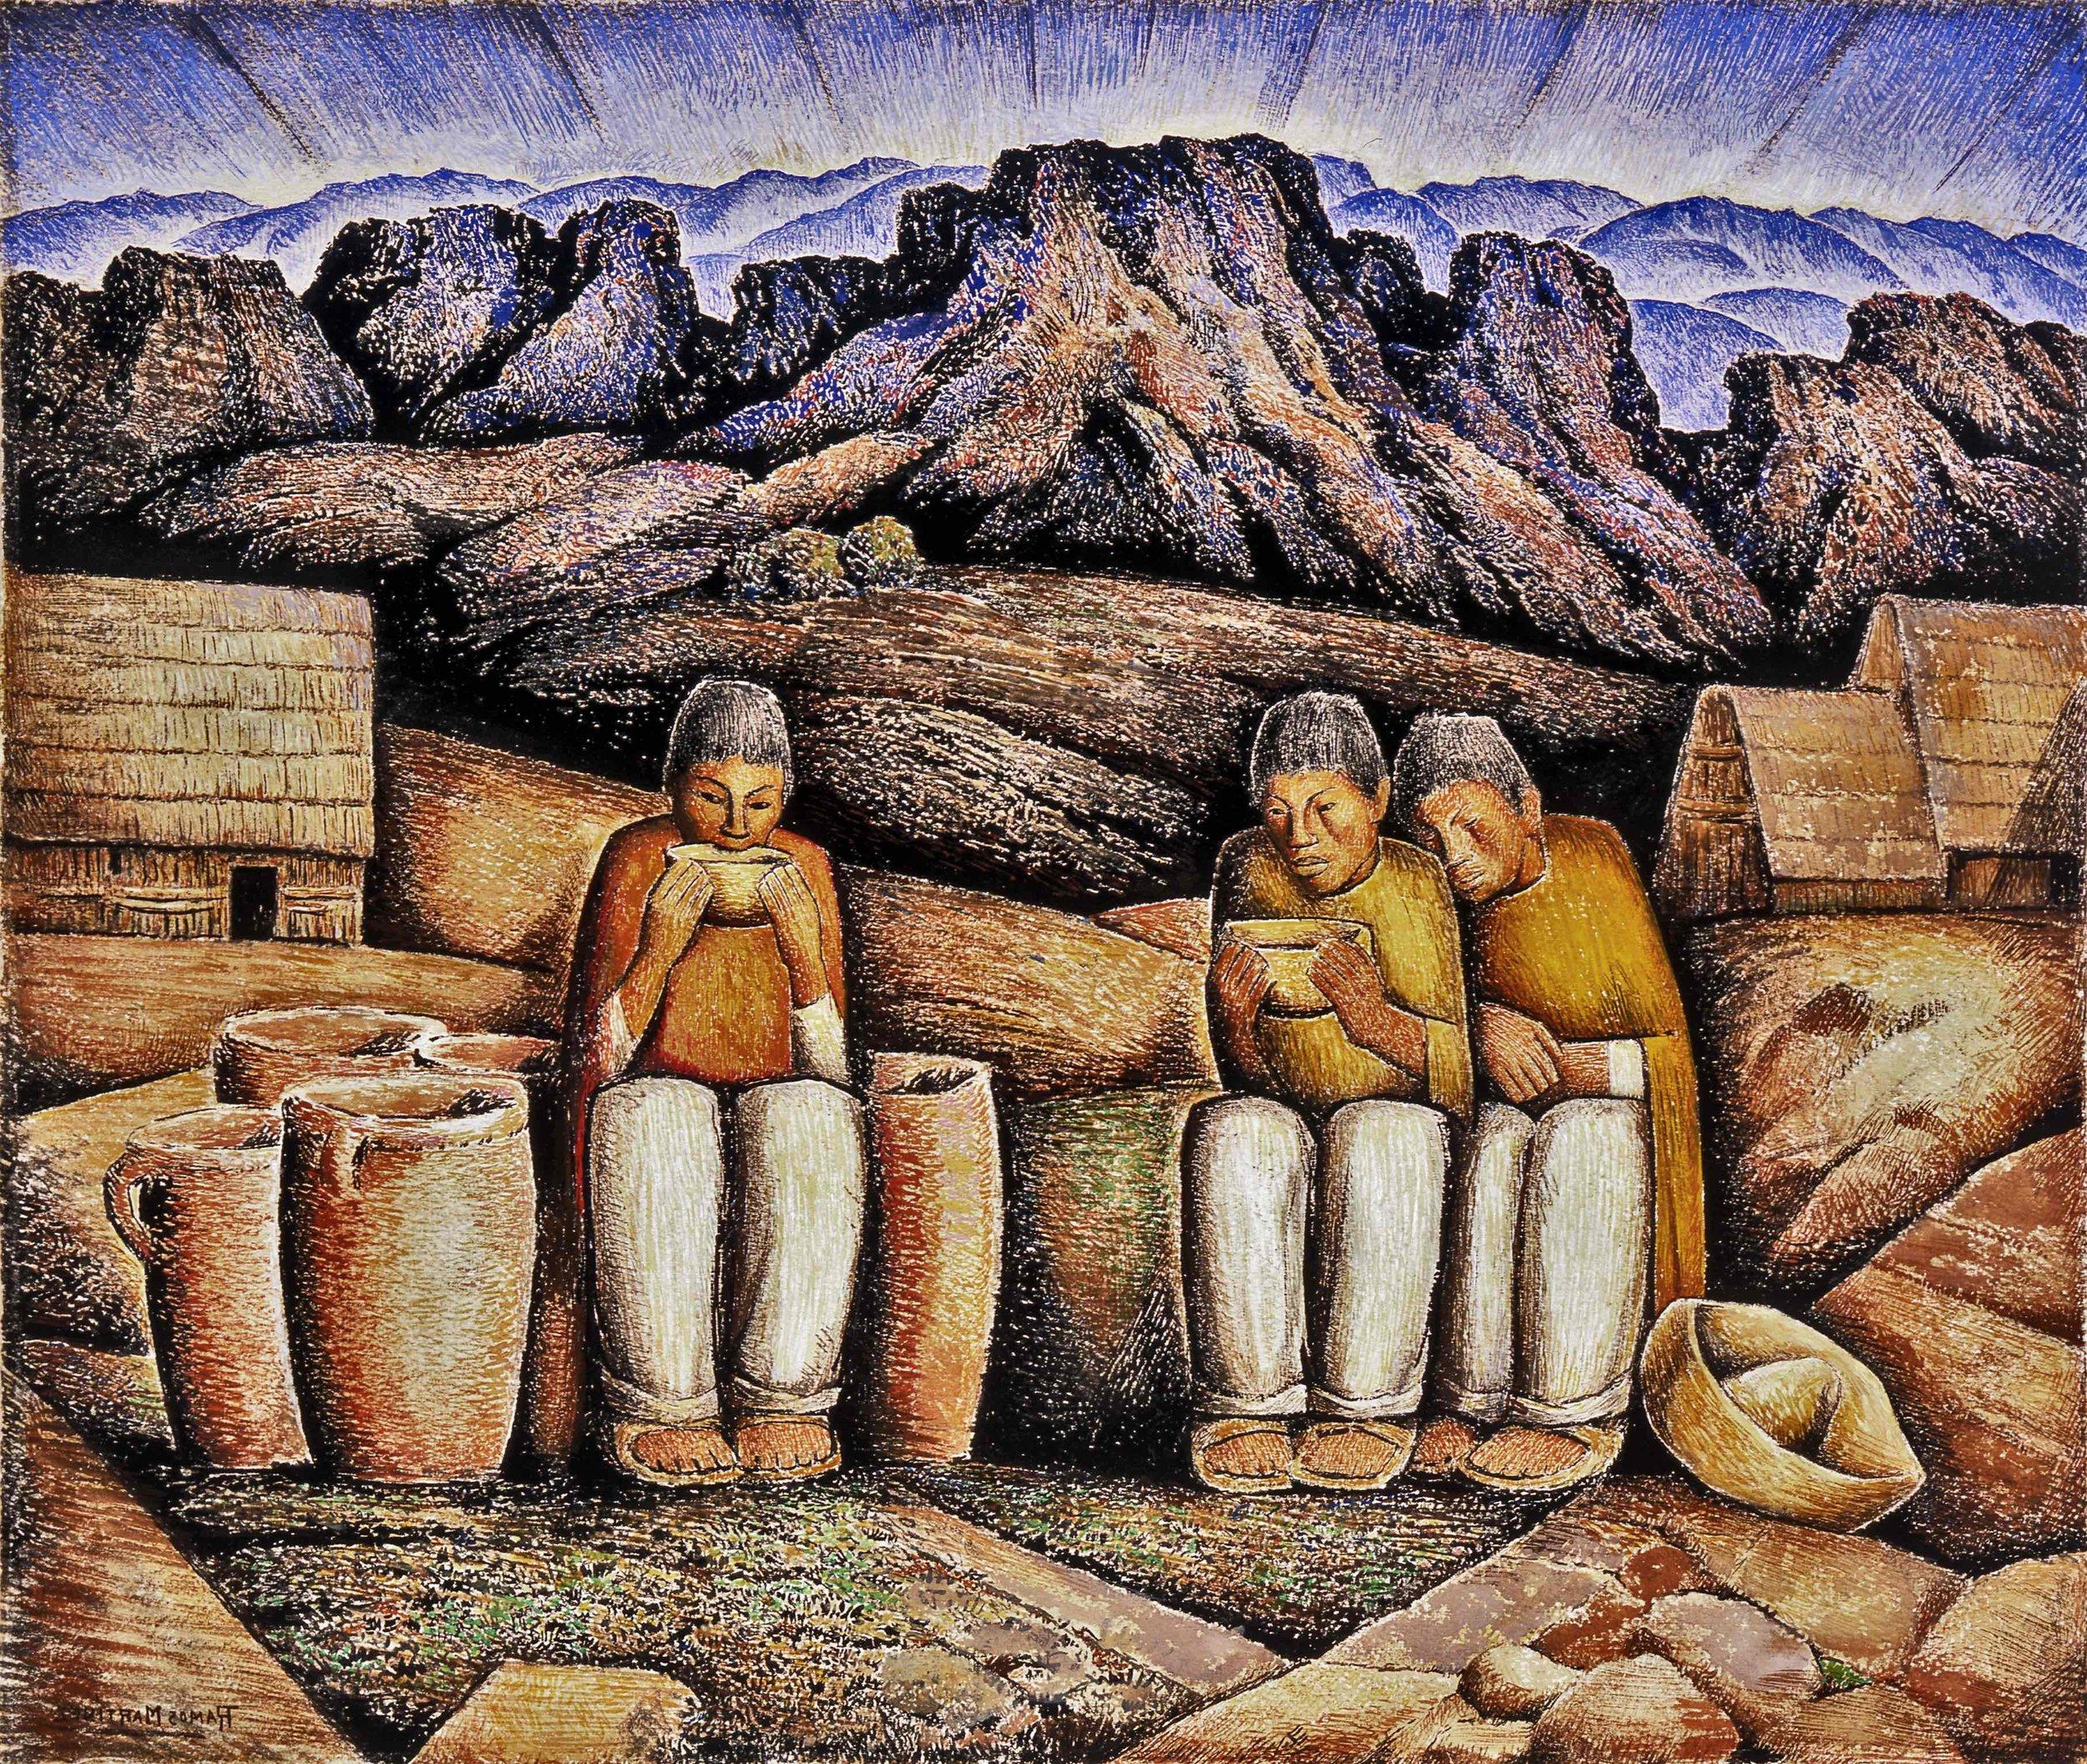 Bebiendo Pulque (Paisaje de Montañas) / Drinking Pulque (Mountain Landscape)  ca. 1940 gouache and tempera on paper / aguada y temple sobre papel 22 x 26 inches; 55.9 x 66 centímetros Private collection